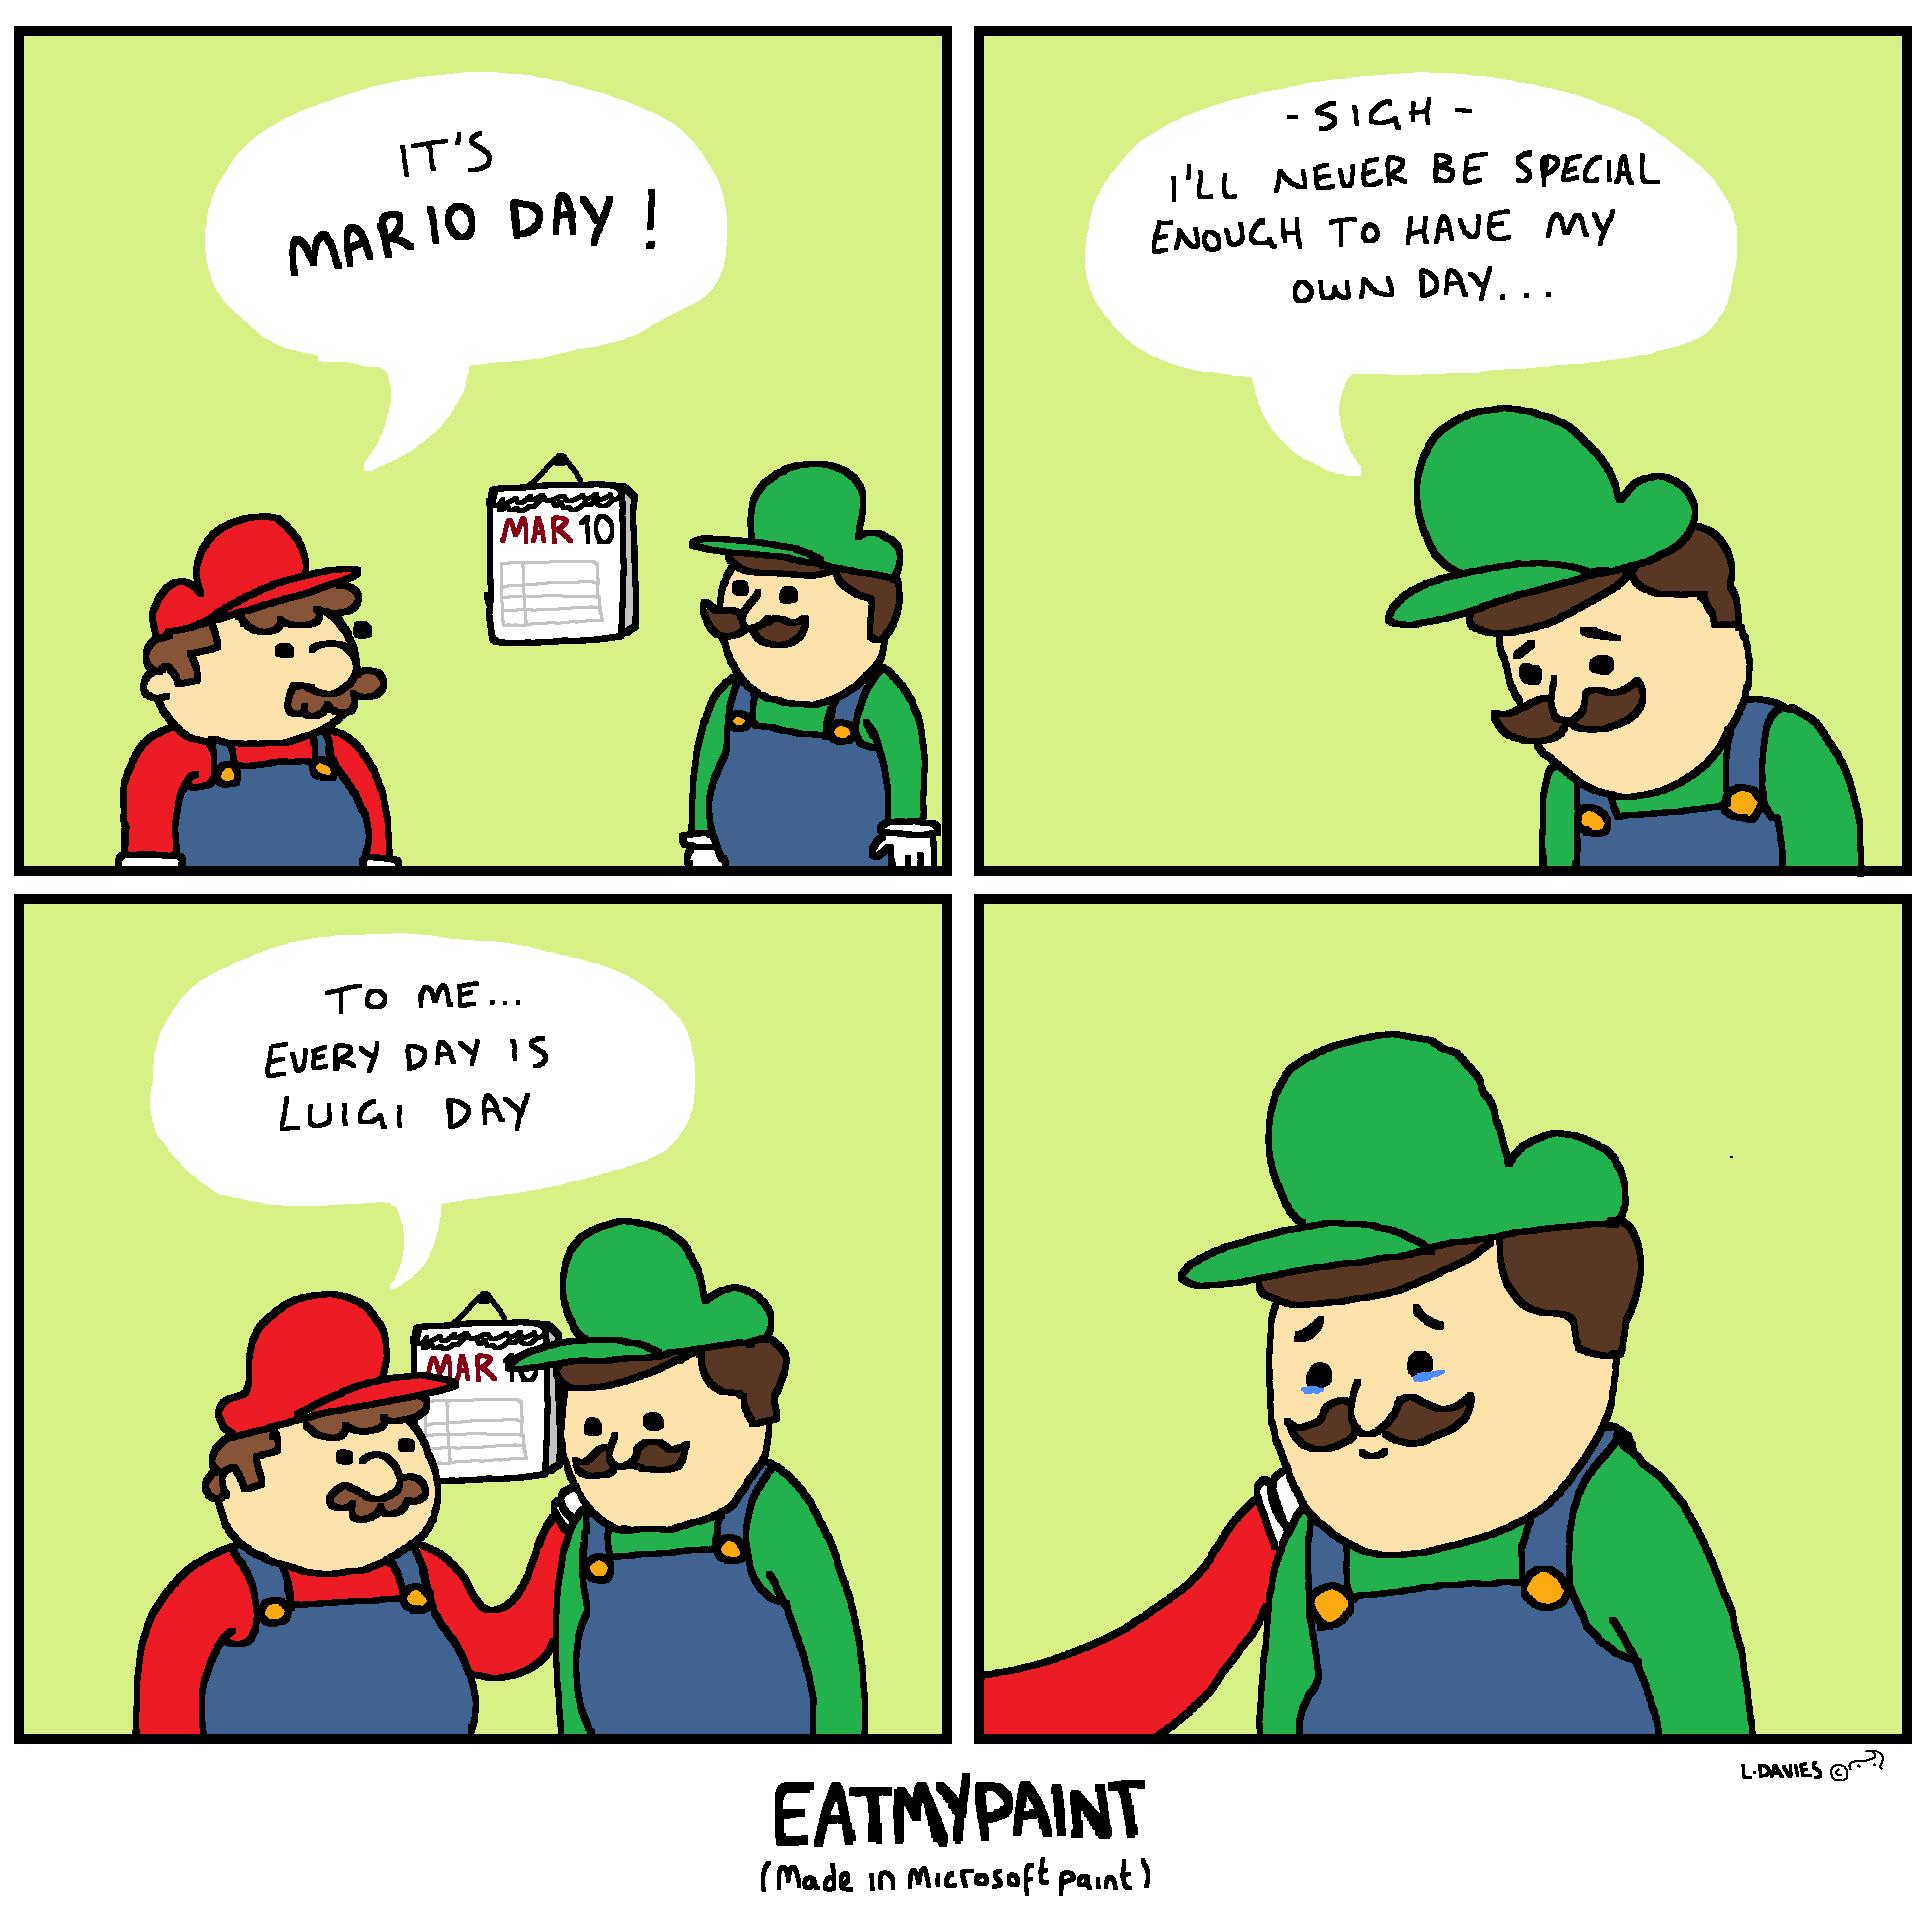 Luigi Day is actually Luitember the gifteenth FYI